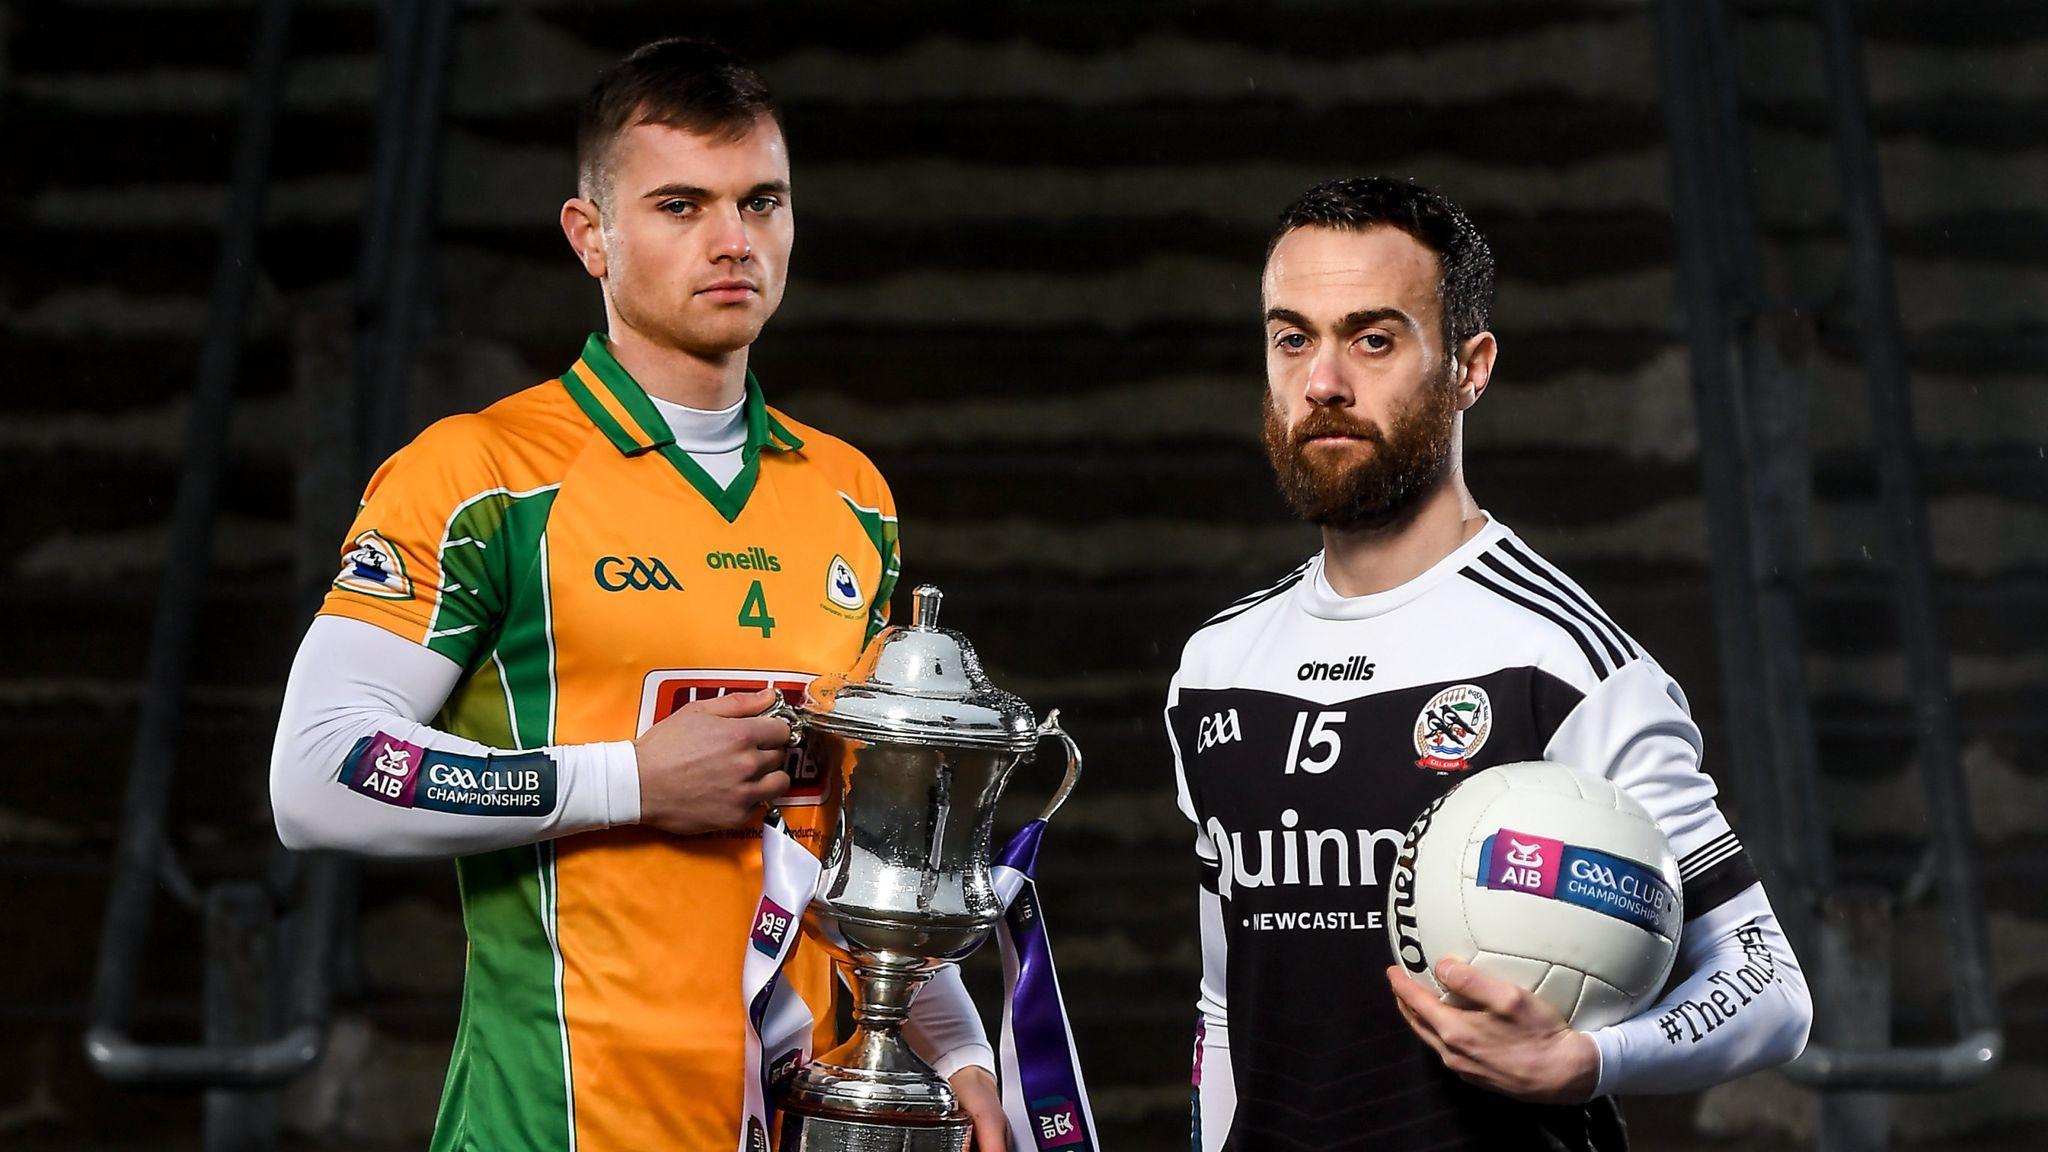 GAA All-Ireland club finals LIVE! Ballyhale Shamrocks vs Borris-Ileigh, Corofin vs Kilcoo